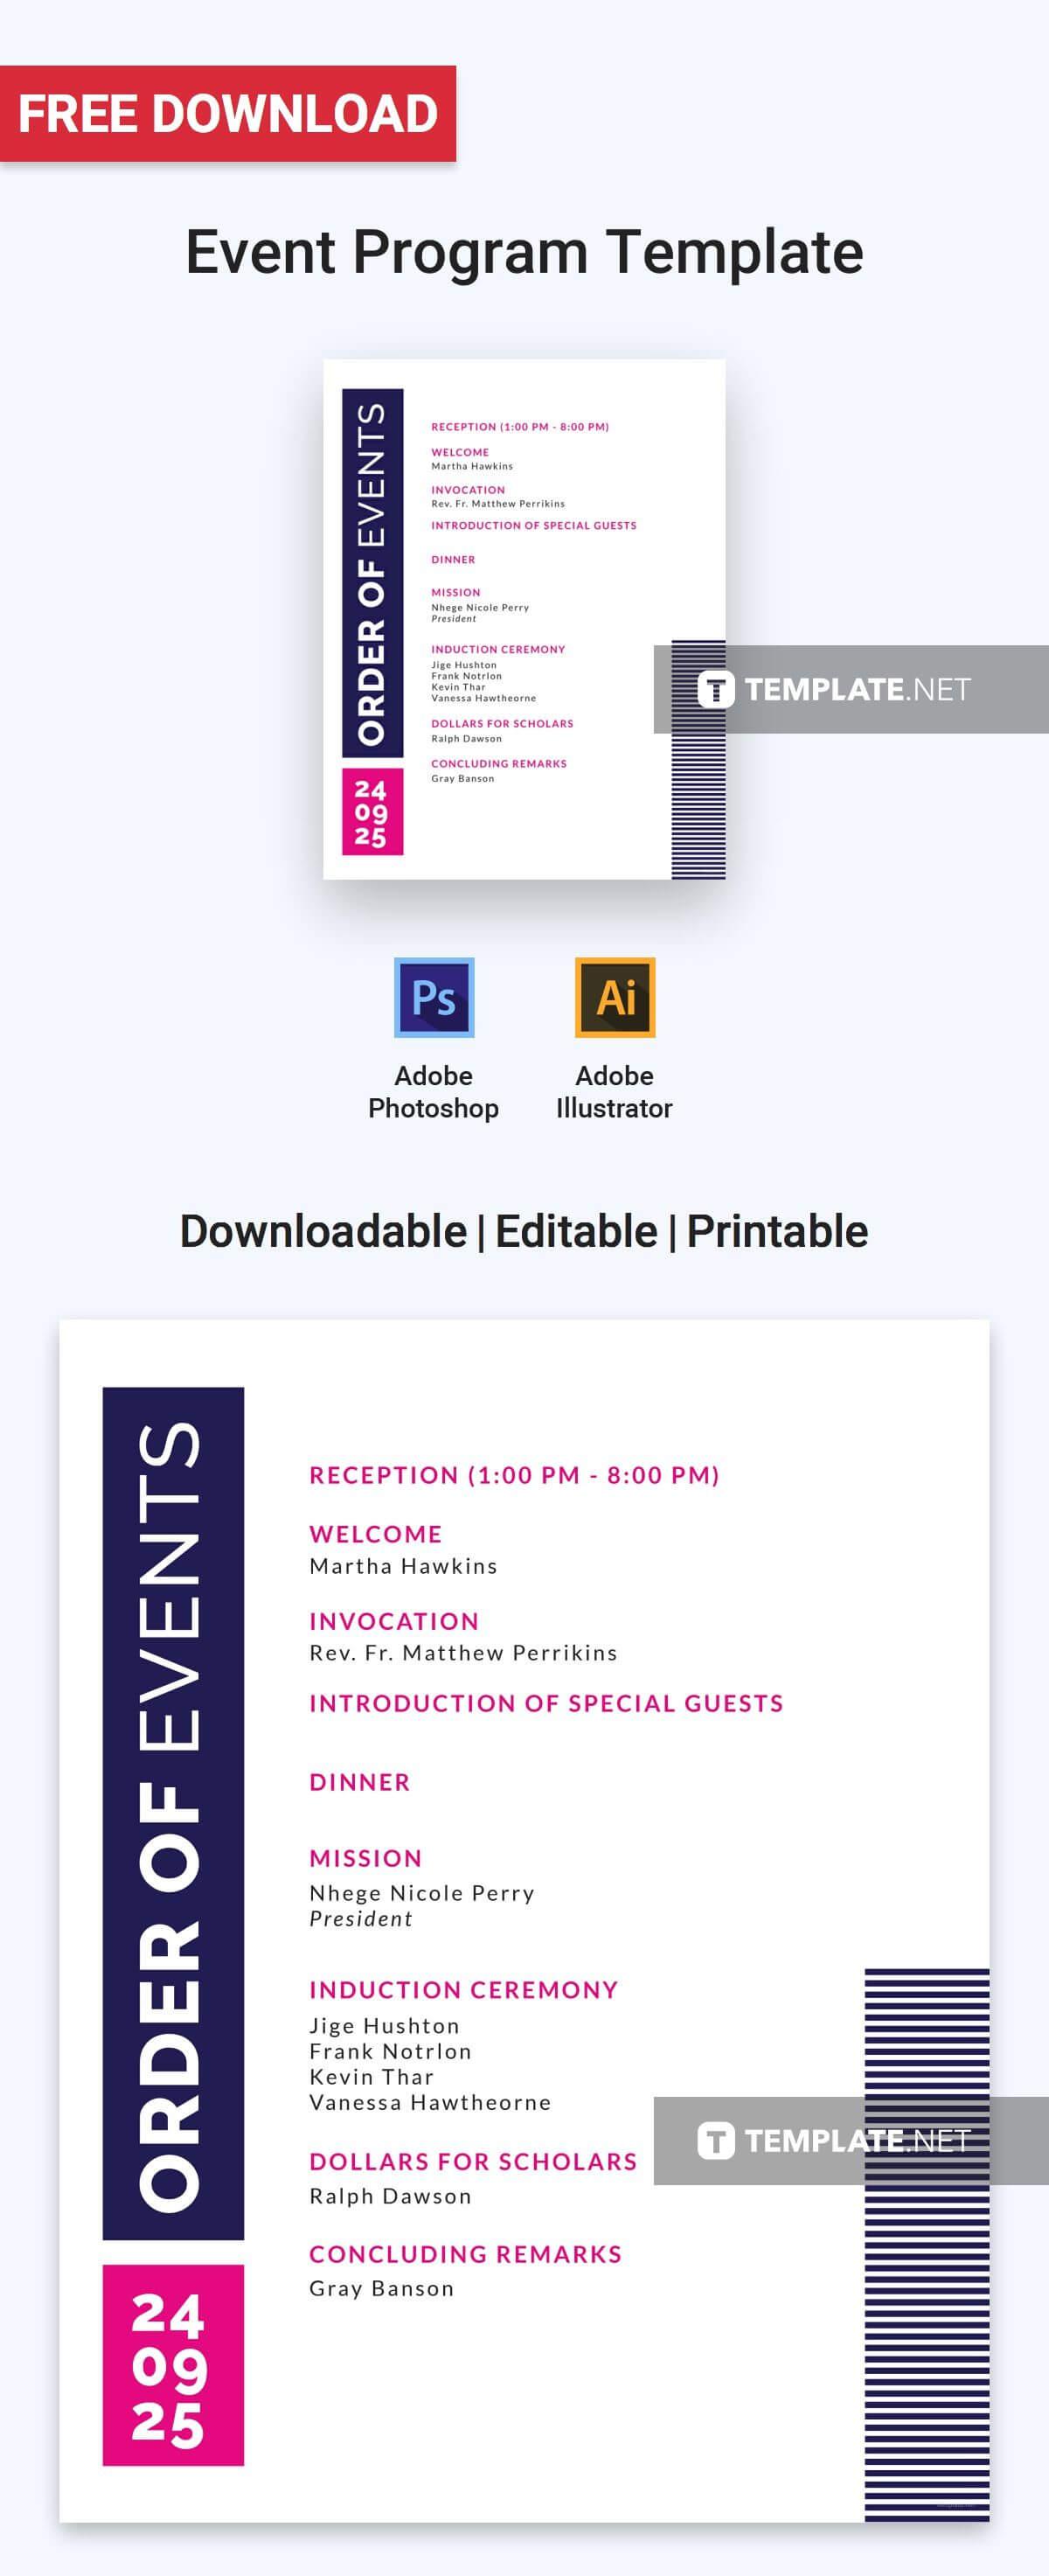 Free Event Program Invitation | Program Templates & Designs Throughout Free Event Program Templates Word